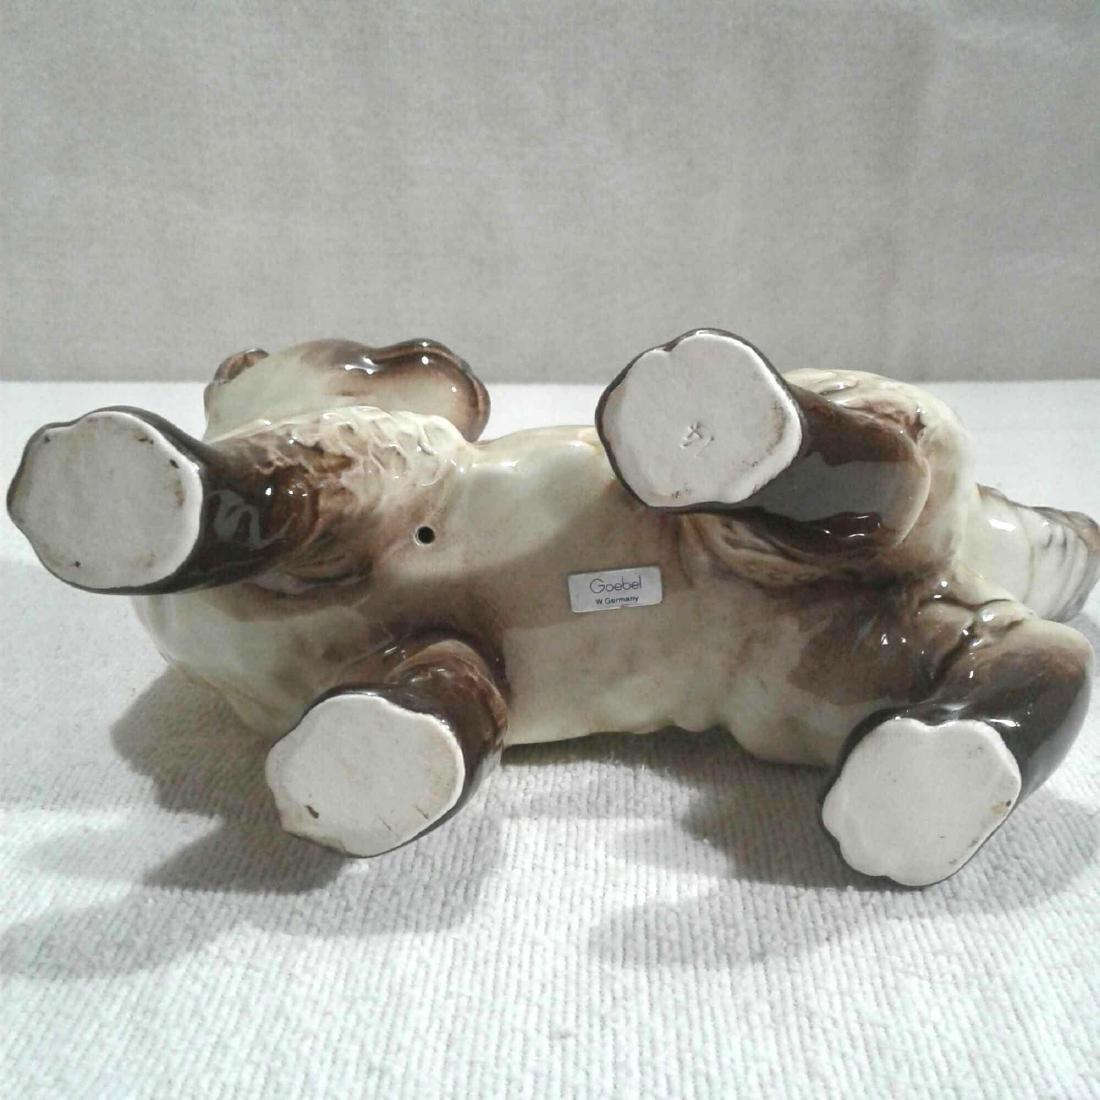 Vintage Goebel Ceramic Cat Figurine - 8